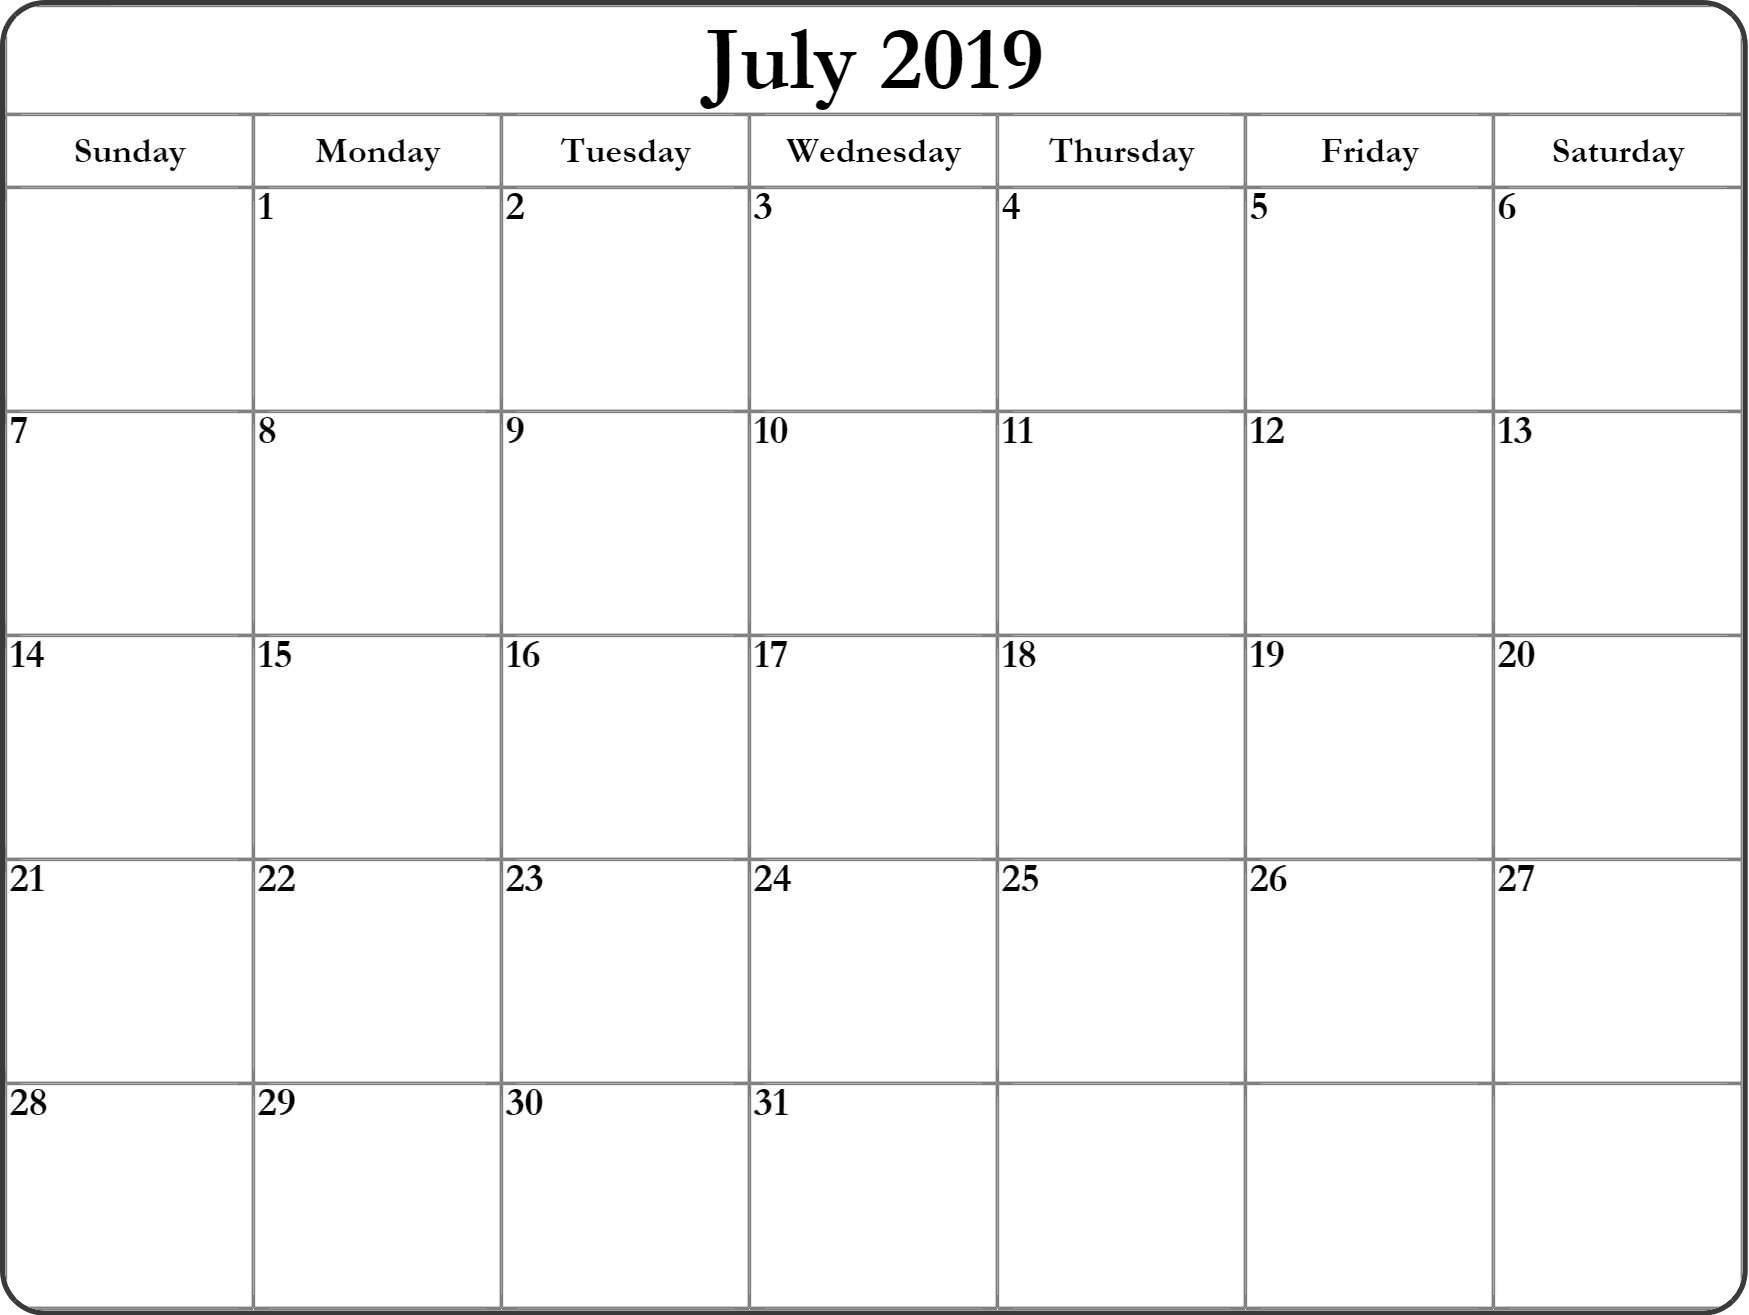 Printable July 2019 Calendar Free Template - Free Printable Calendar pertaining to Calendar Printable Free Template